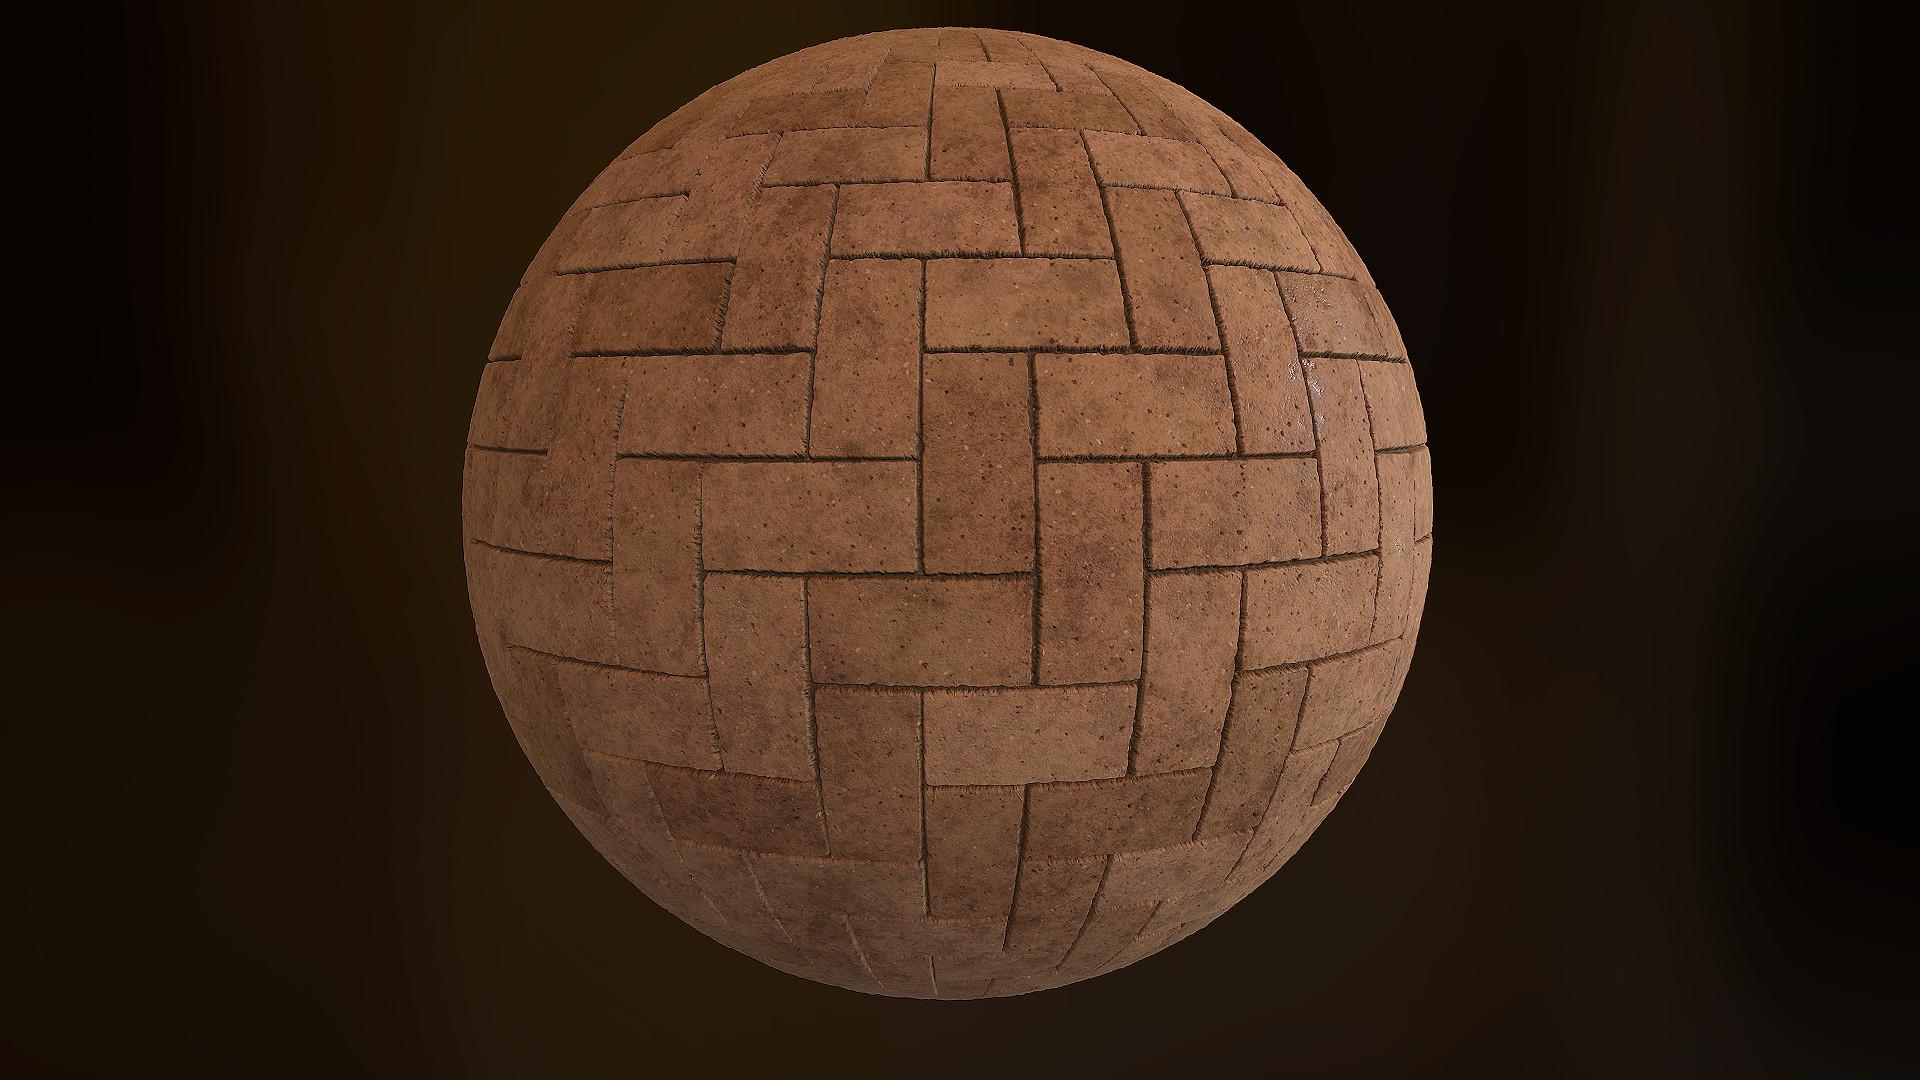 Andre jonsson herringbone brick 01 02